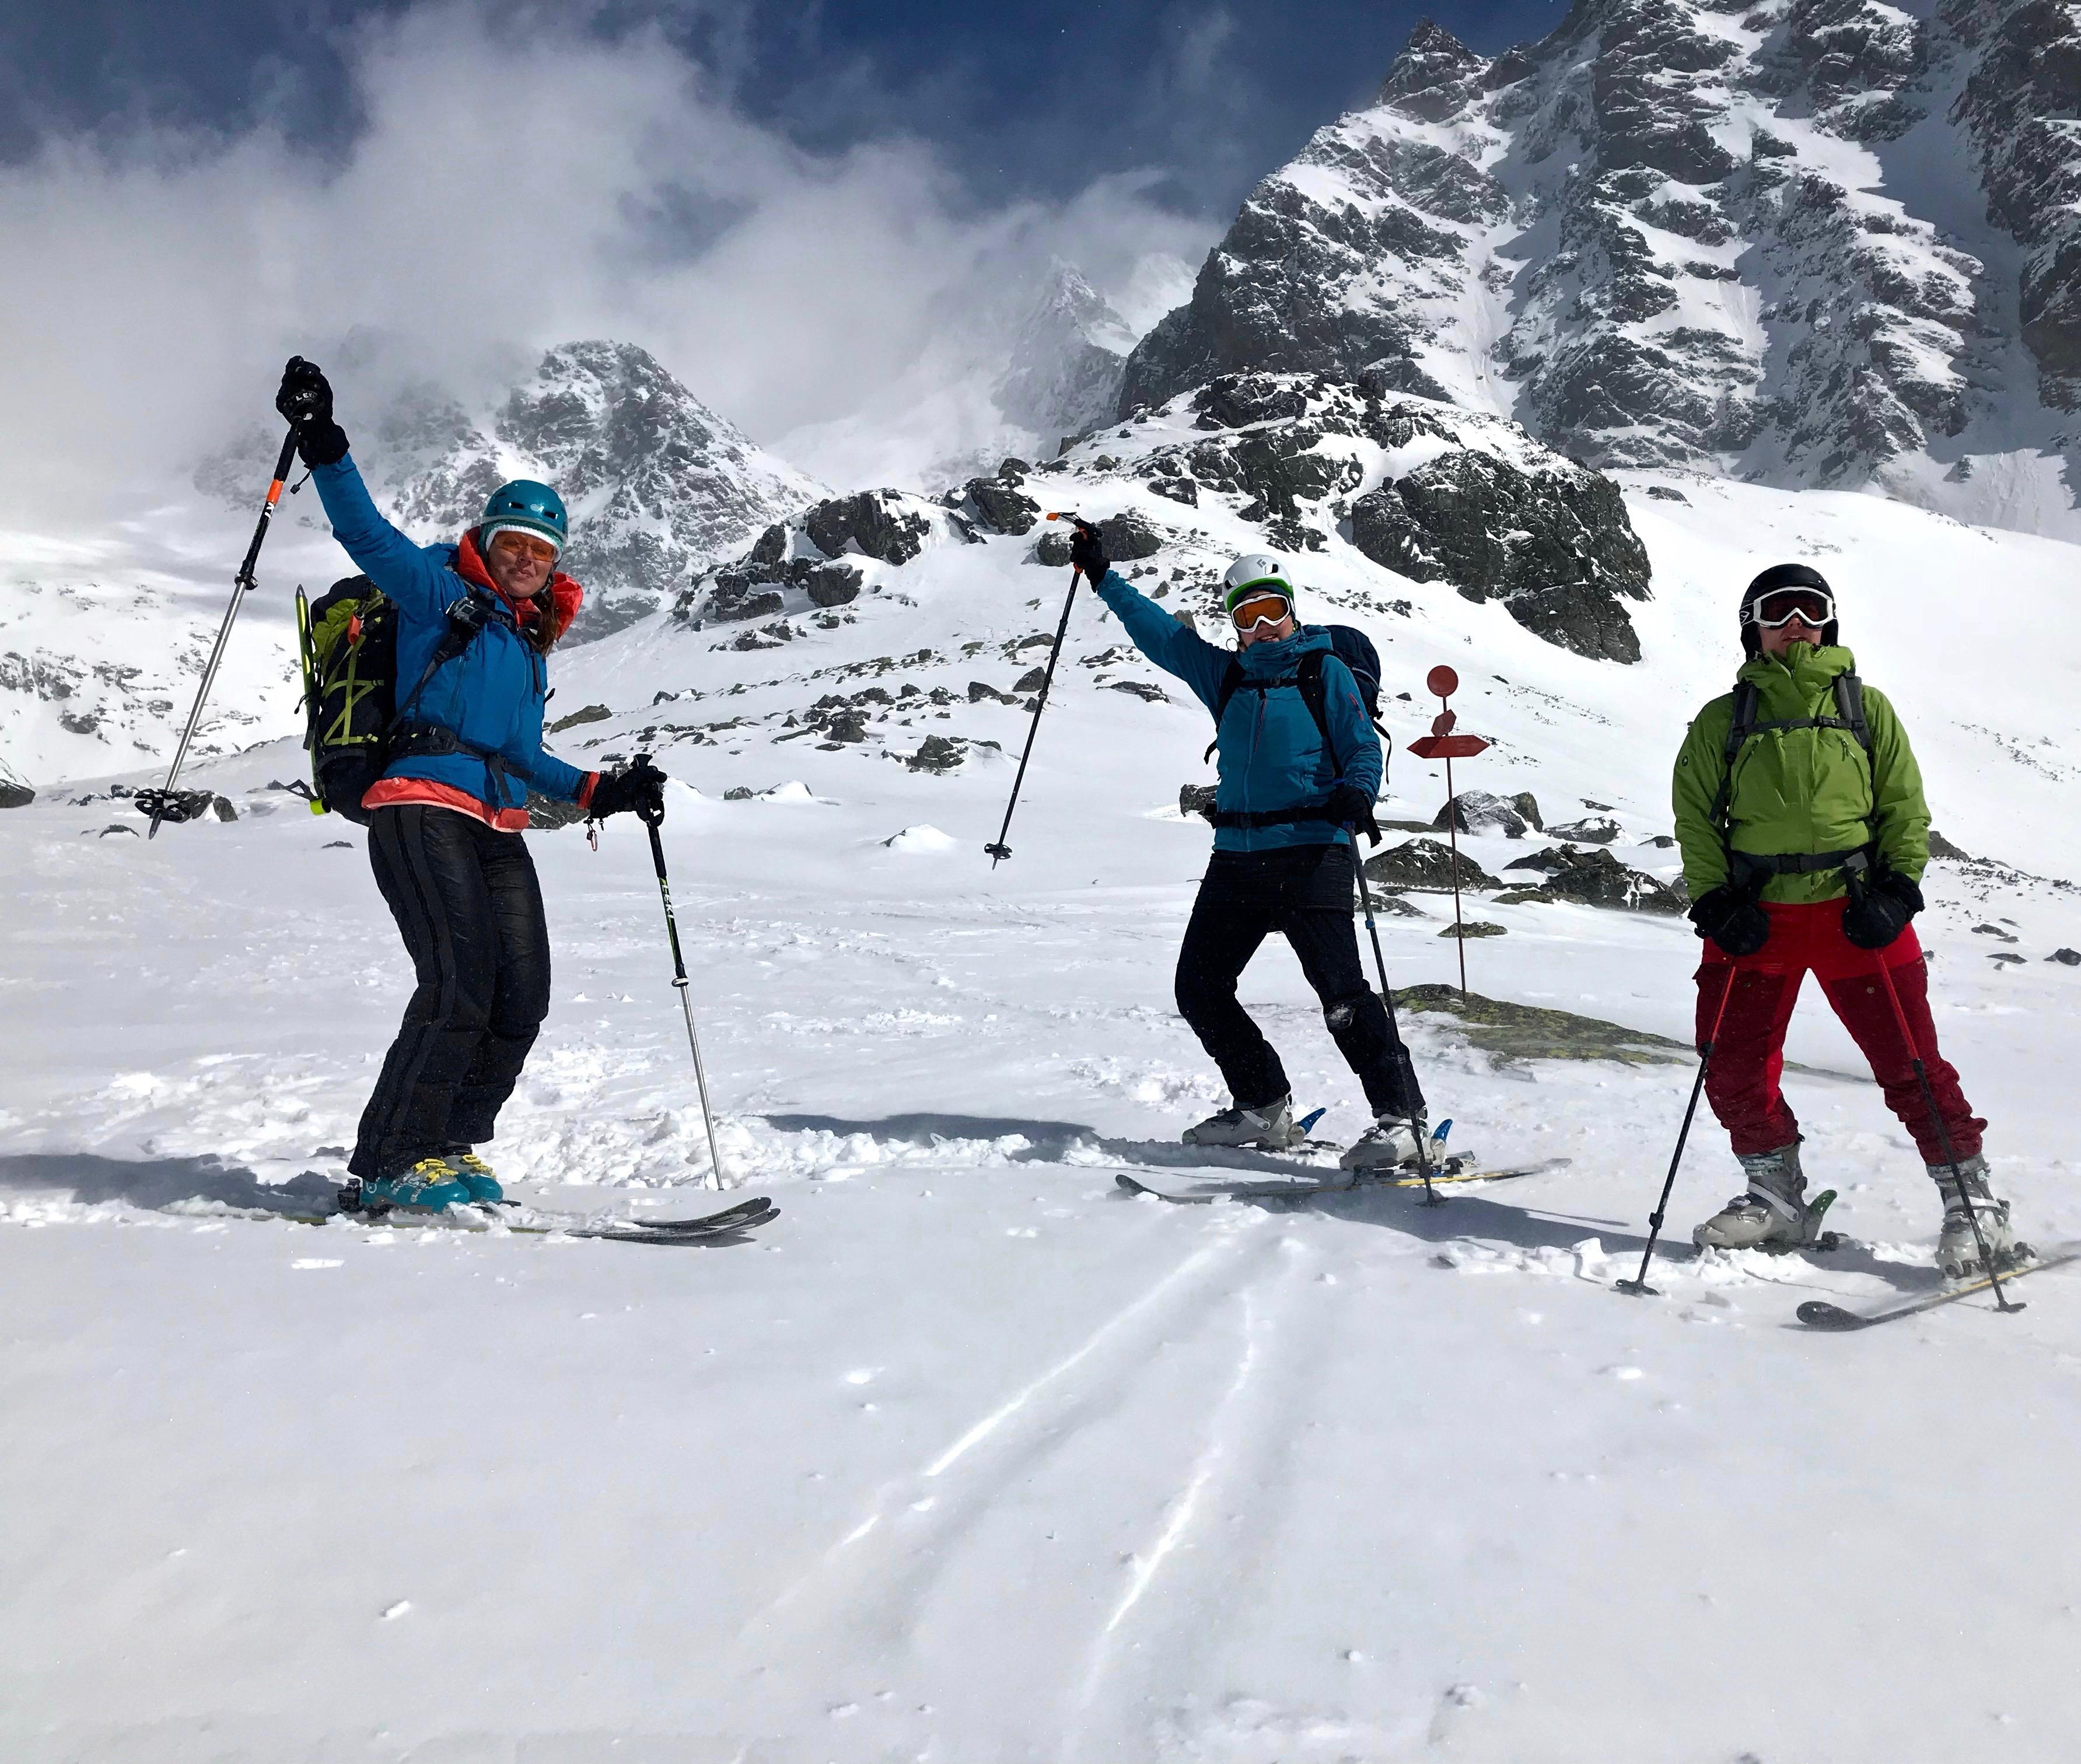 Skiing Trips, SLOVAKIA – Skiing Trips